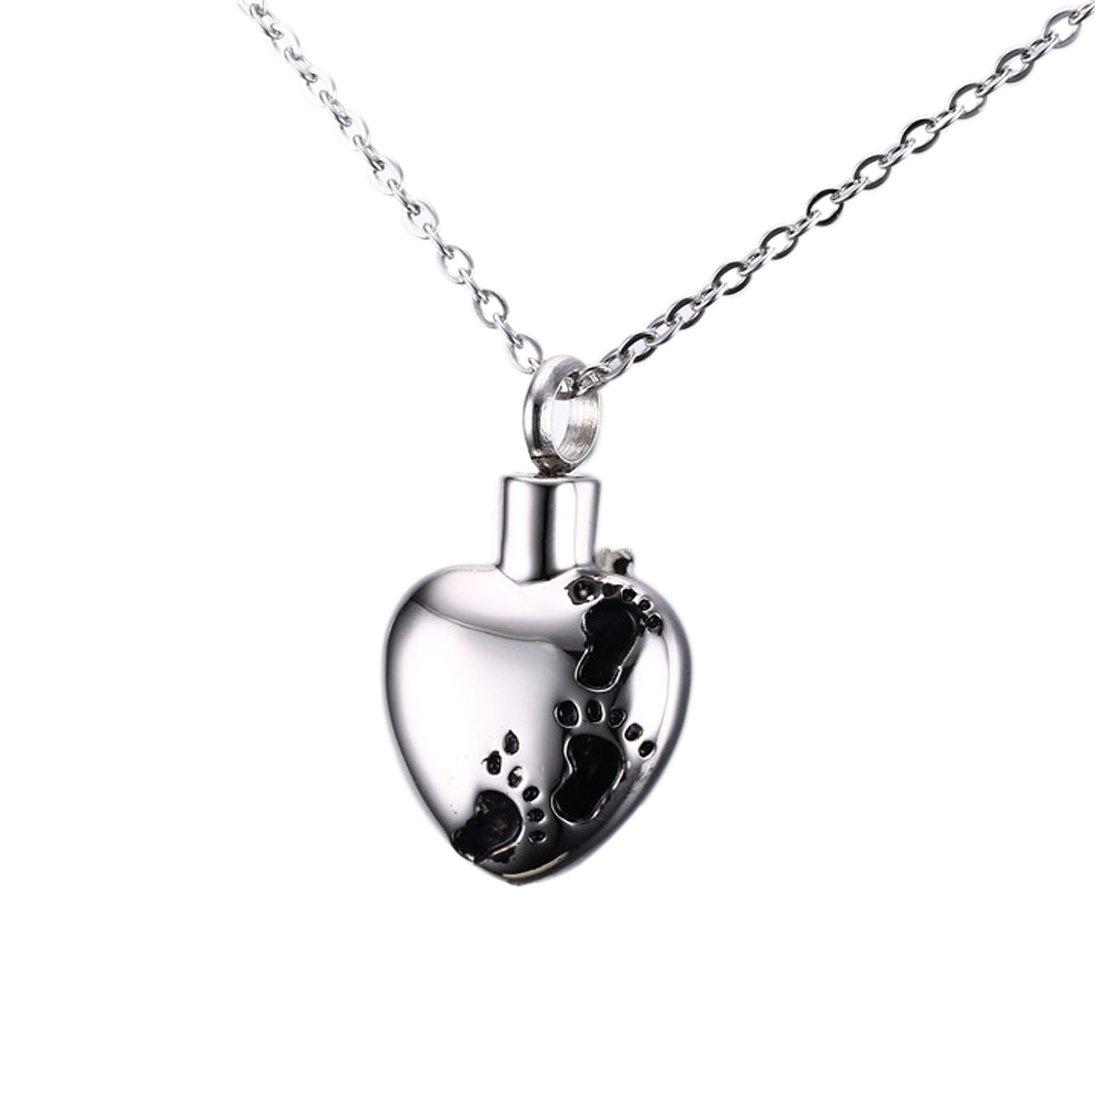 Stainless Steel Heart Shape Child Cremation Memorial Keepsake Urn Pendant Necklace